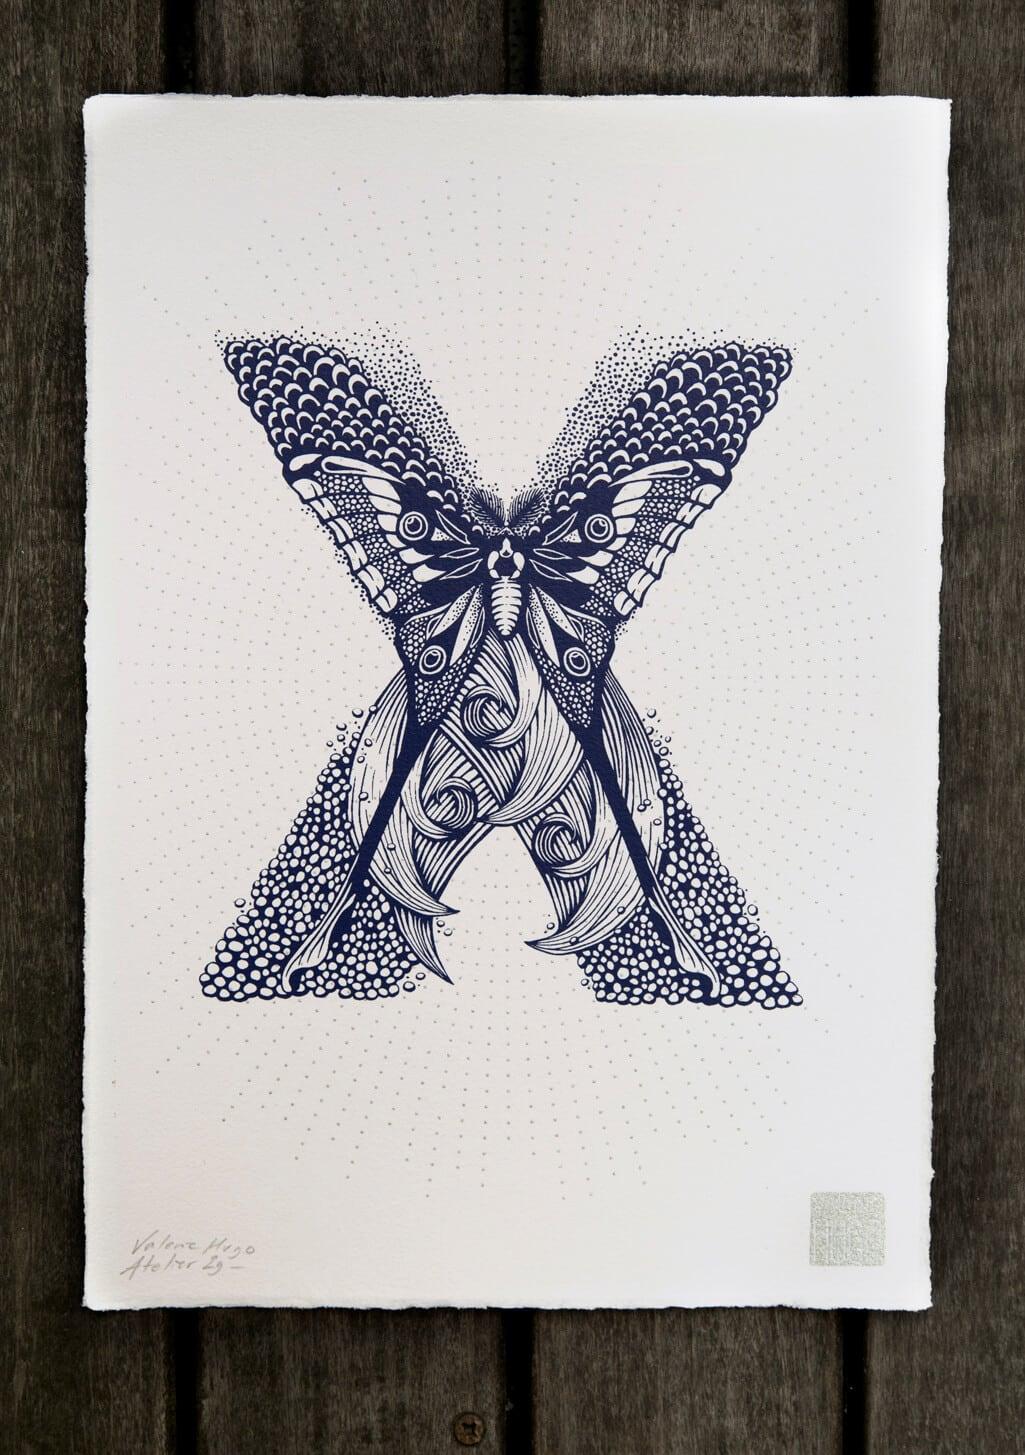 typography-valerie-hugo-fy-15